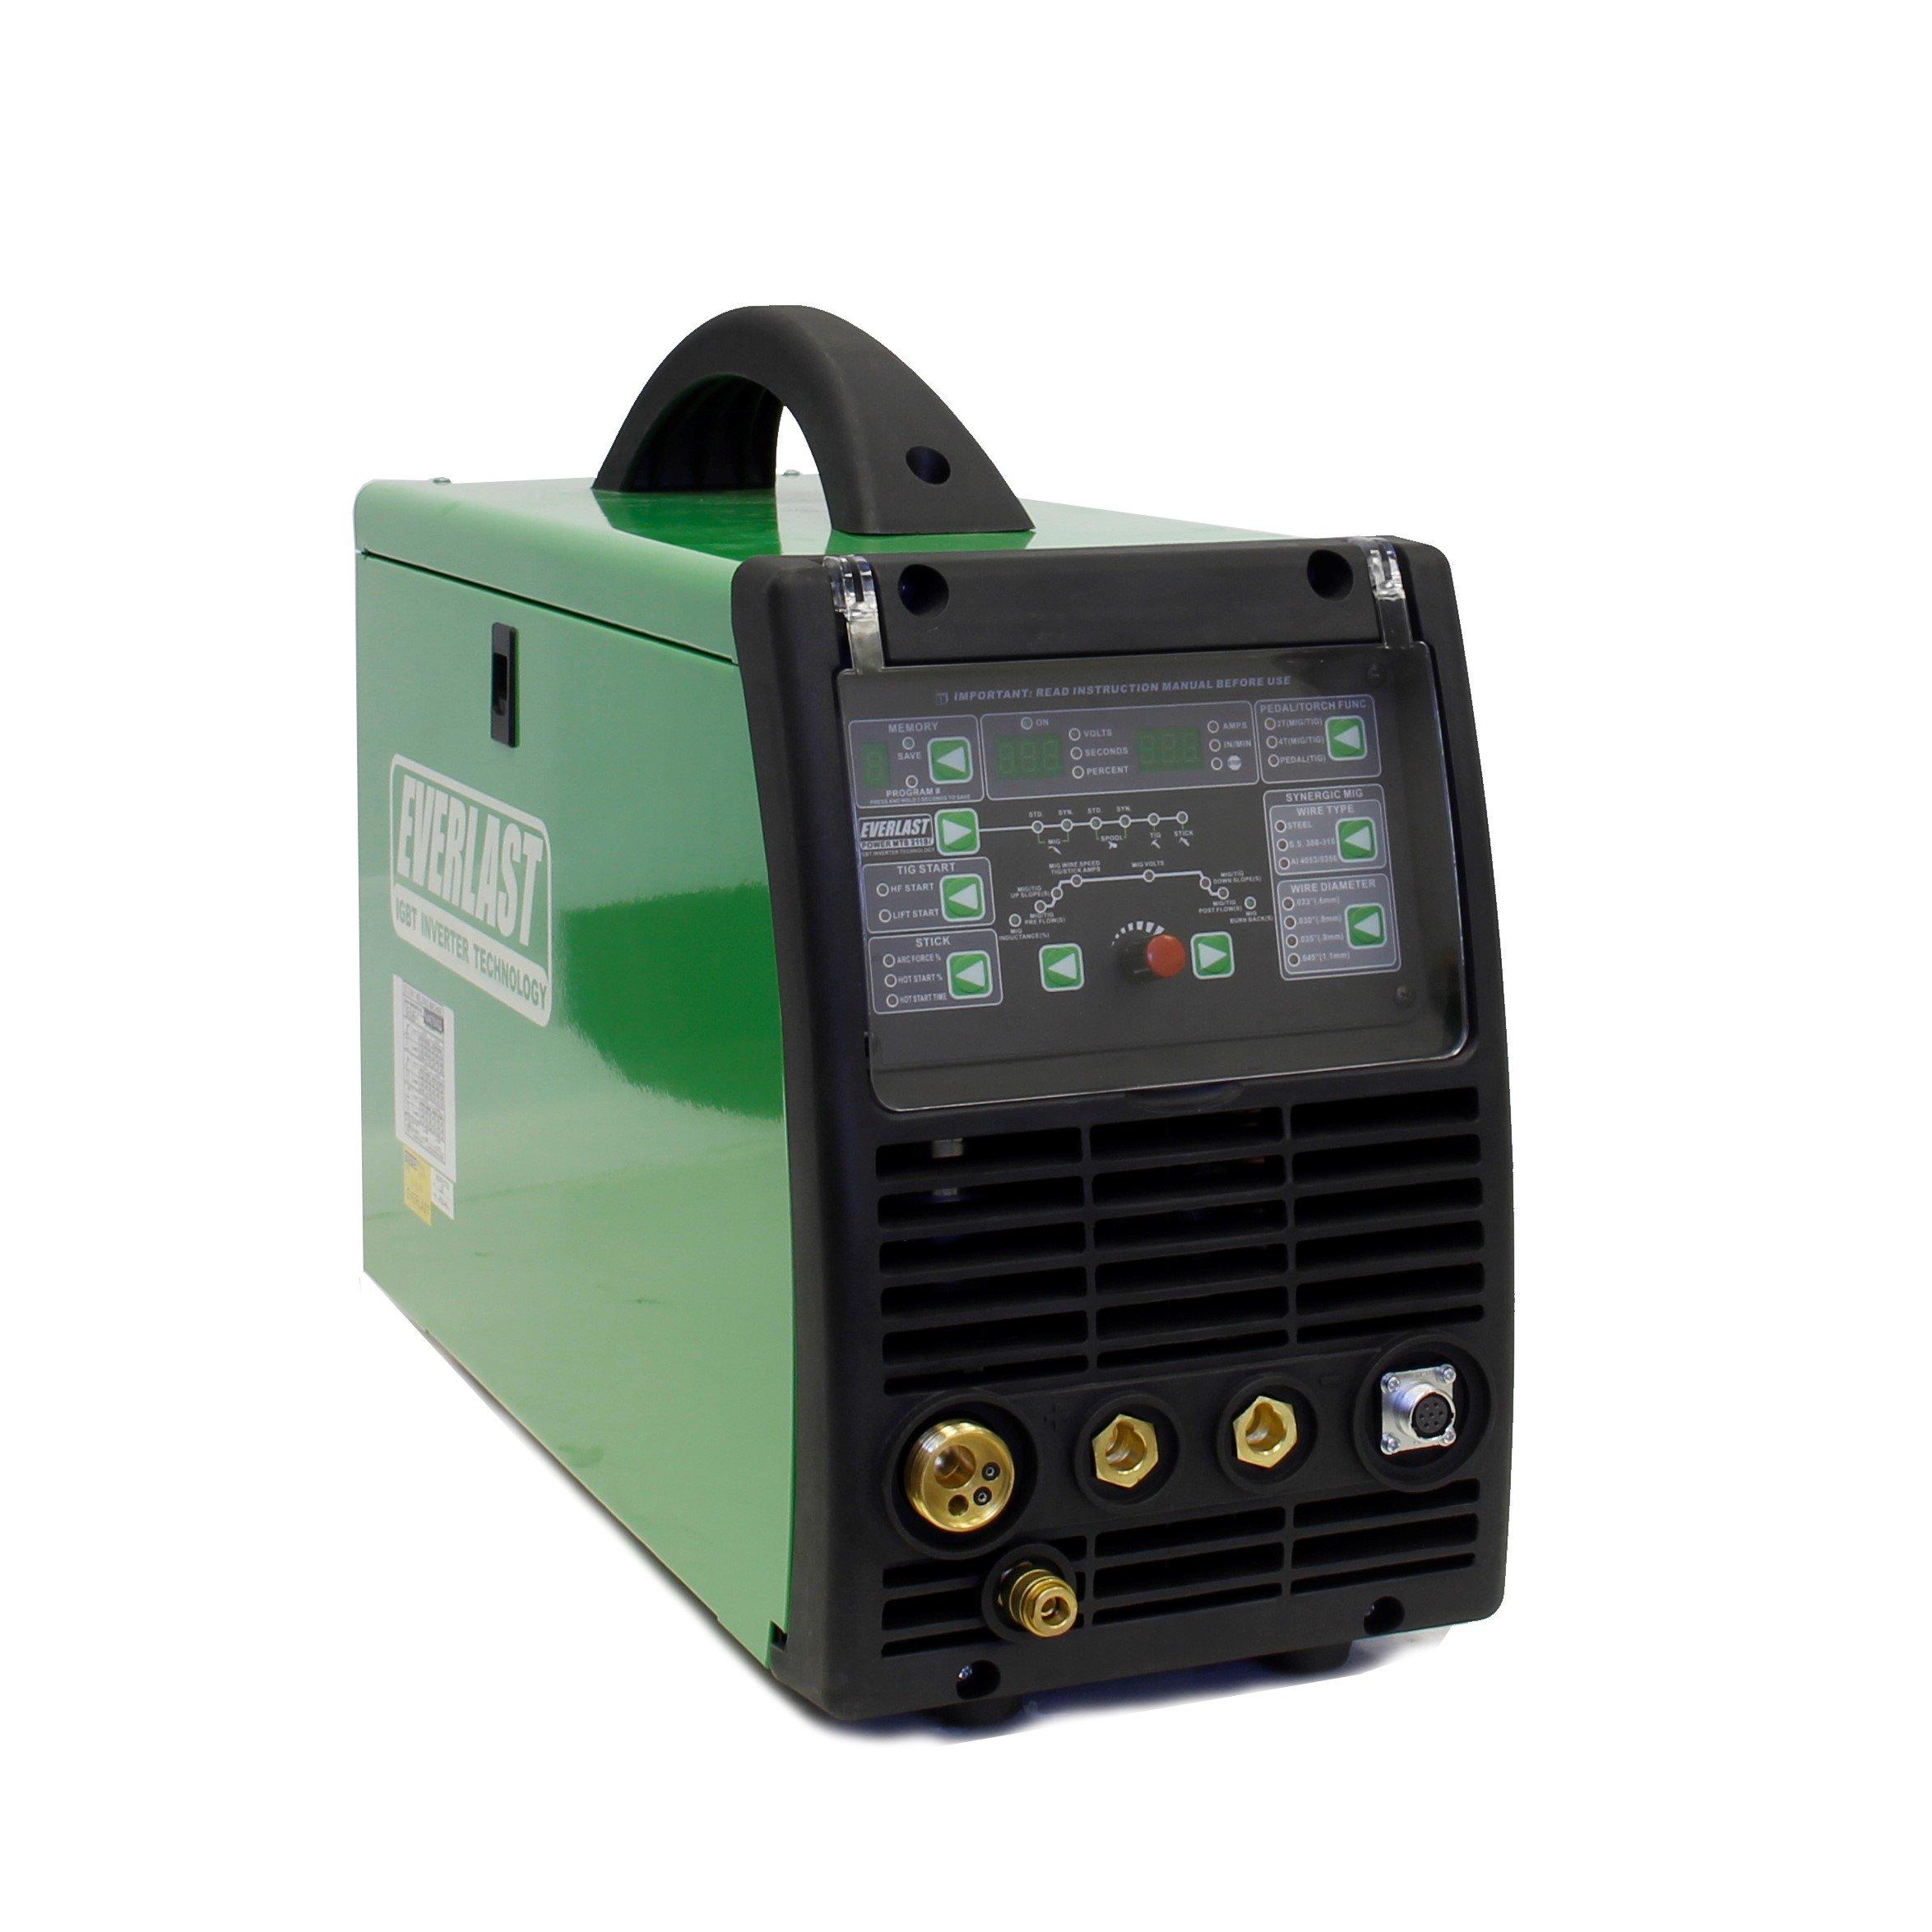 2018 Everlast PowerMTS 211Si MIG TIG Stick 200amp 110v/220v Multi Process new Welder by Everlast Power Equipment (Image #1)